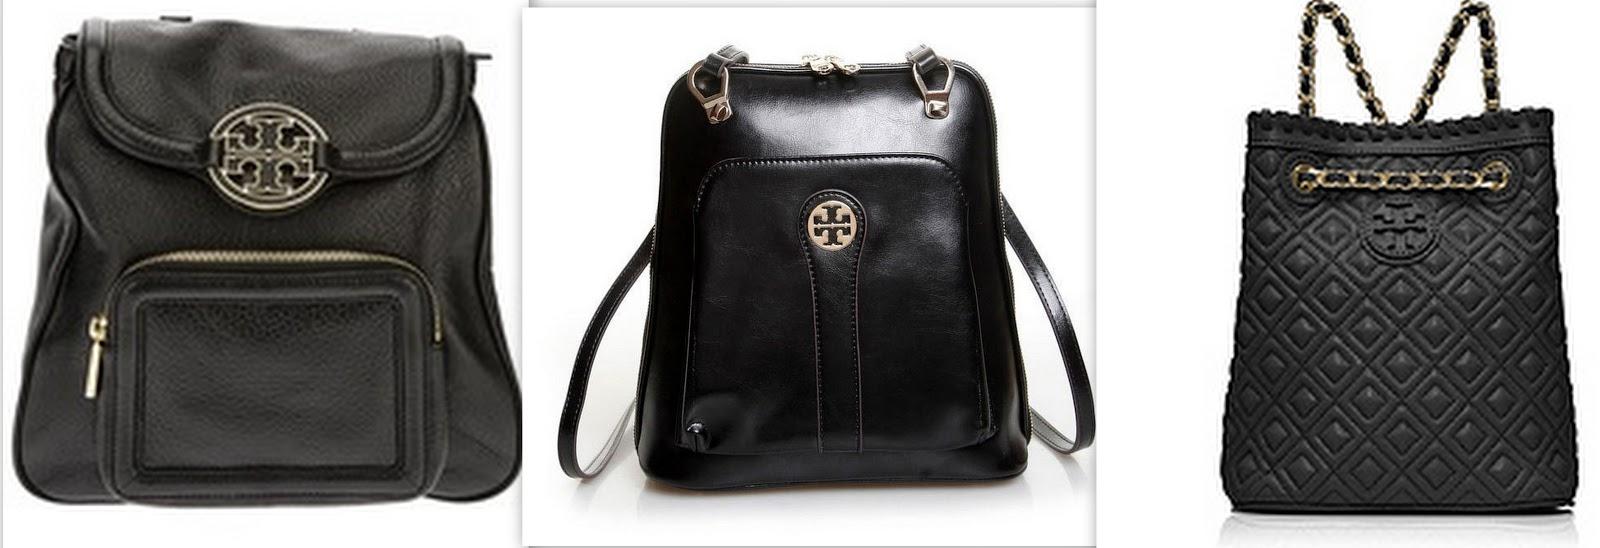 backpacks trend, animal print backpack, leopard print backpack, black and beige backpacks, designer backpacks, pink backpacks, floral backpacks, trends spring 2014